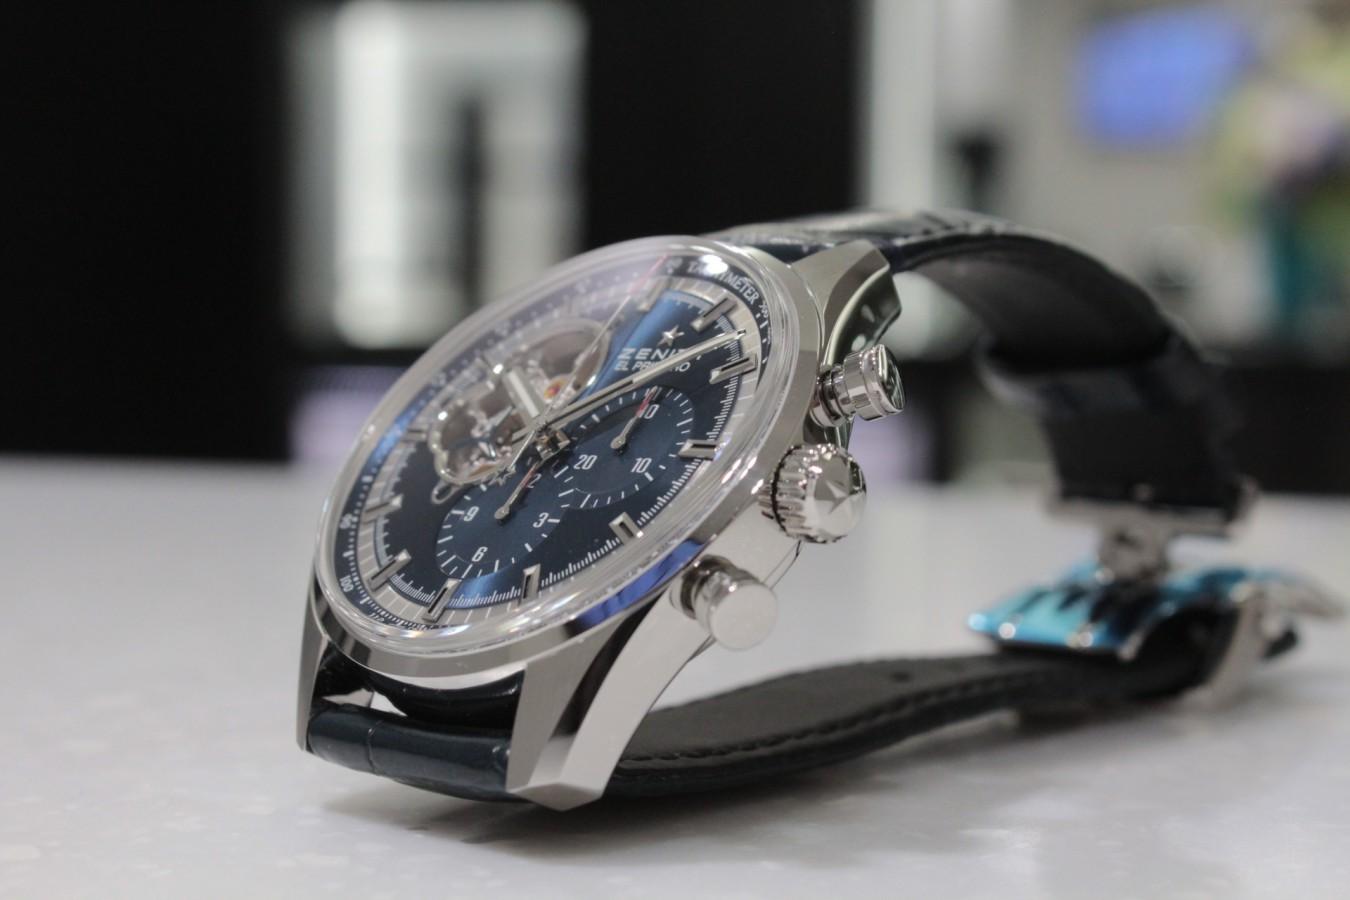 IMG_4276 高級感の漂うブルー文字盤が綺麗な「エル・プリメロ オープン」 - CHRONOMASTER